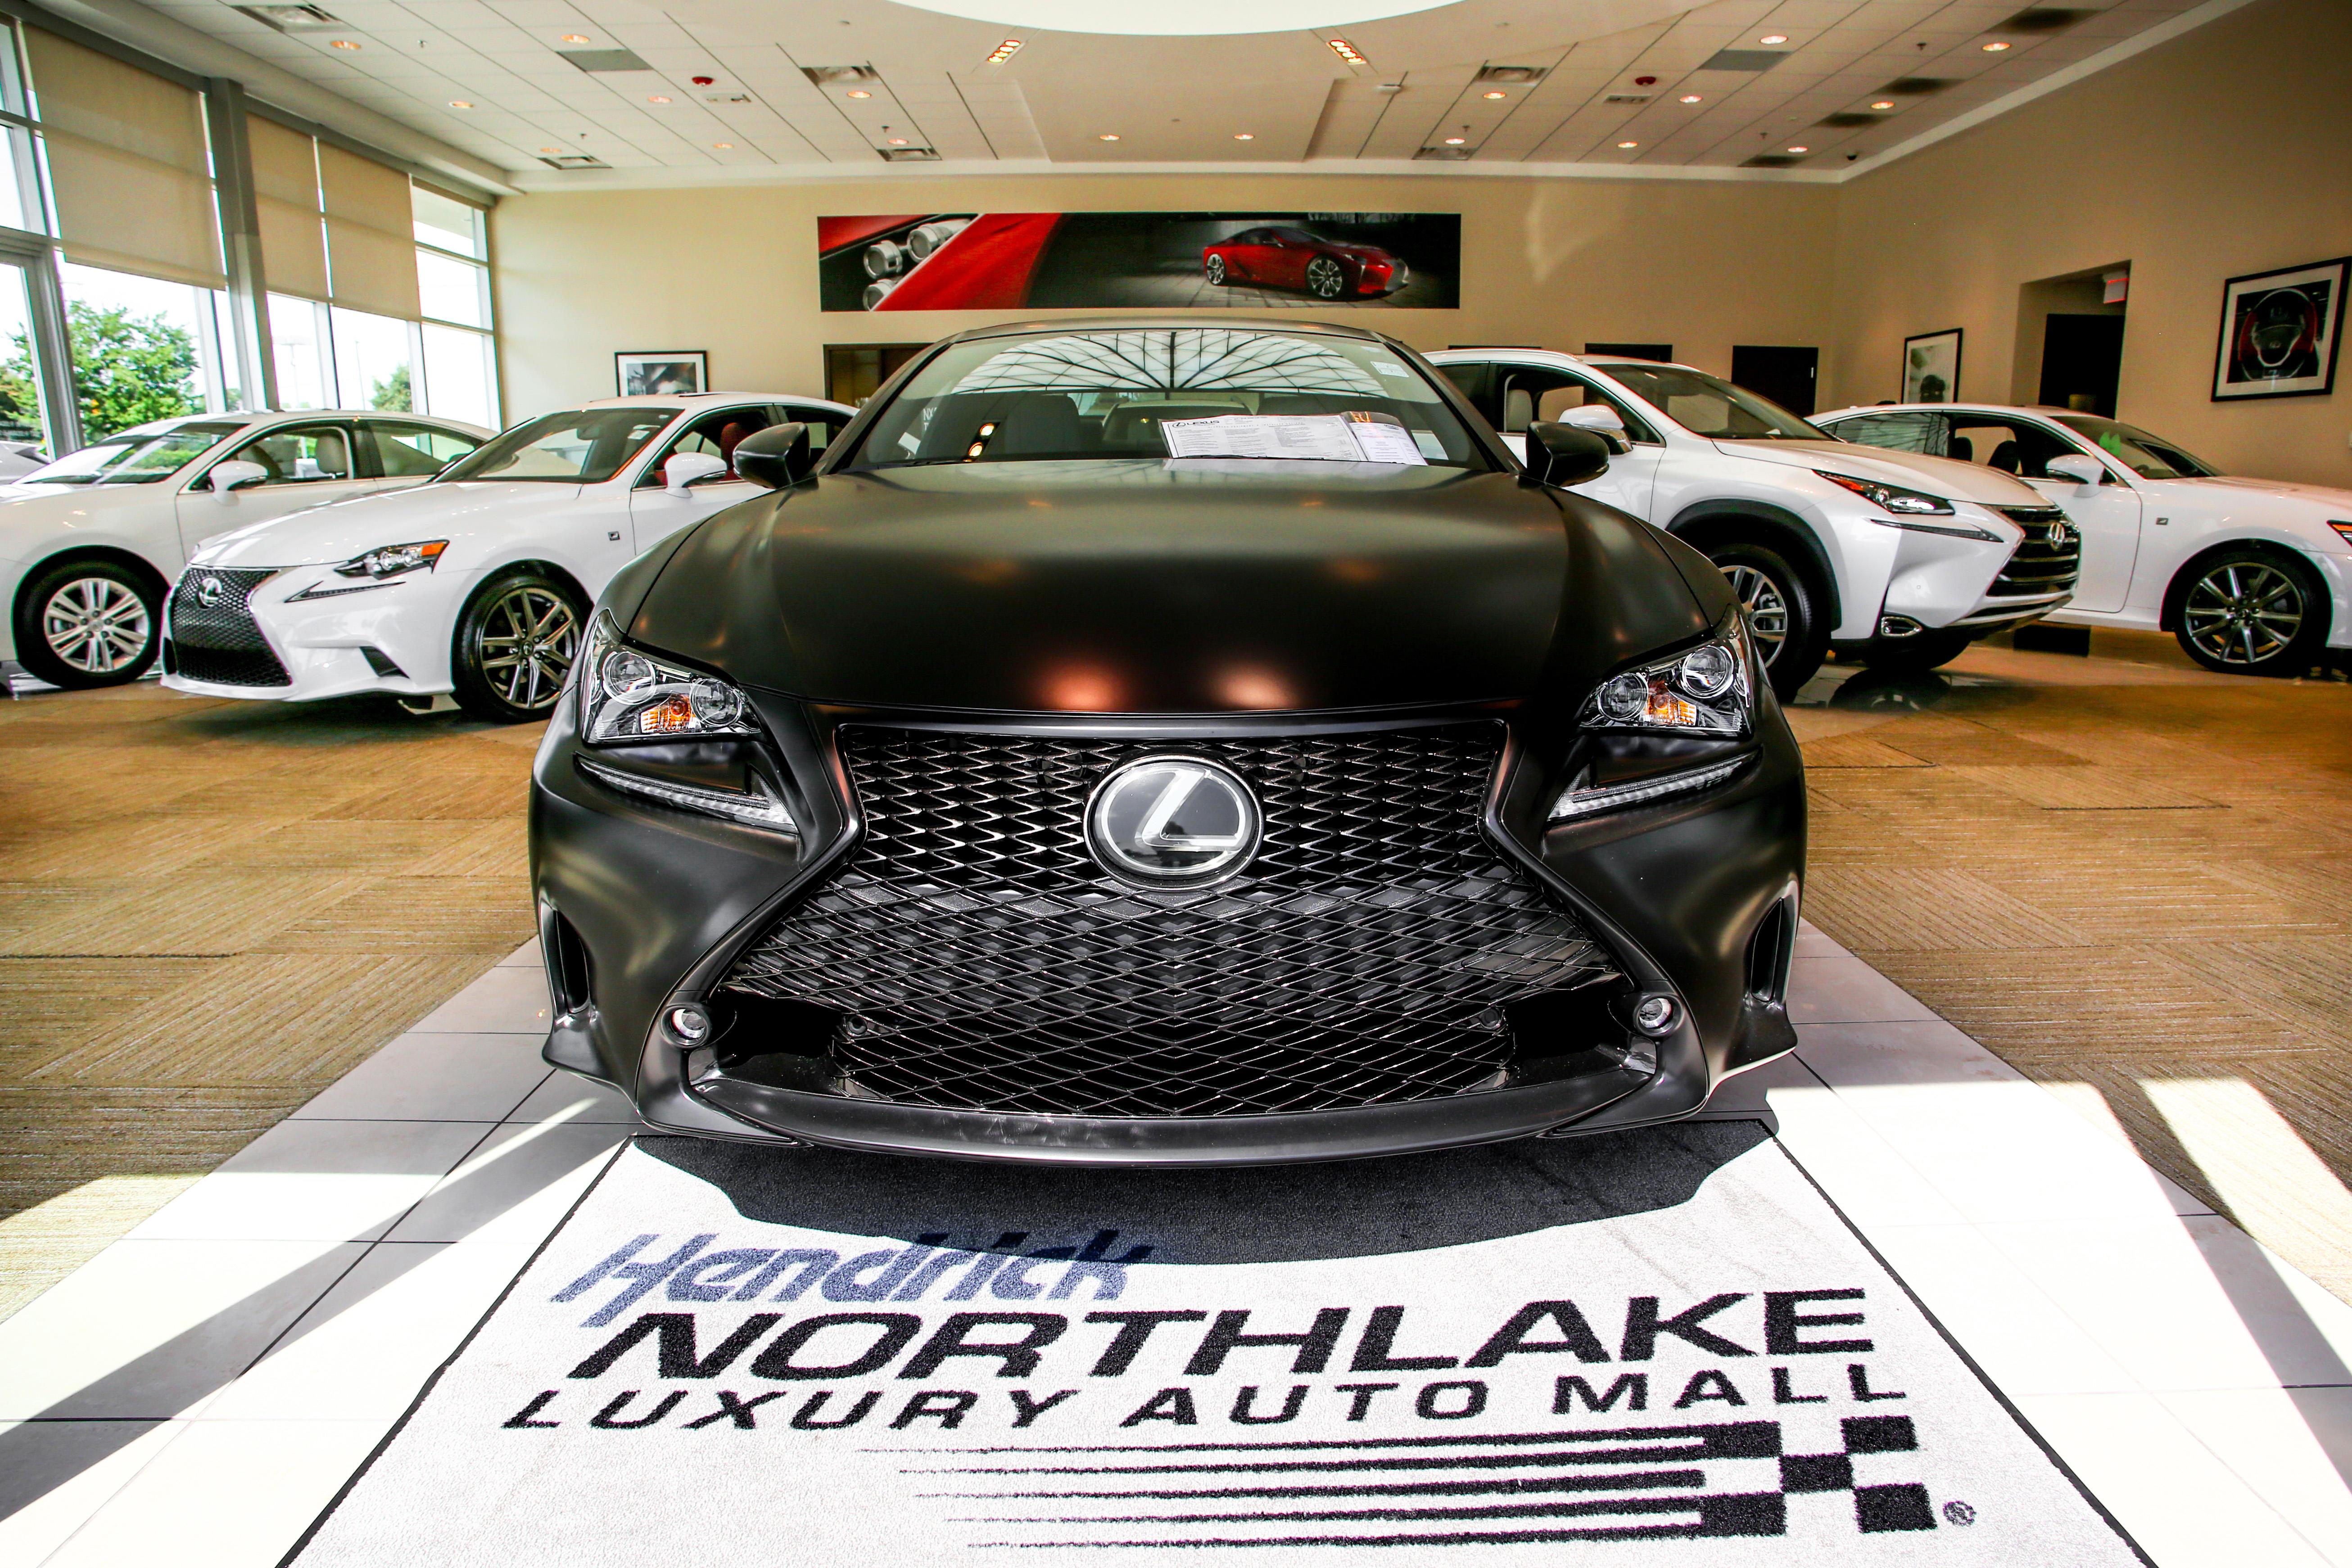 Hendrick Lexus Northlake image 4